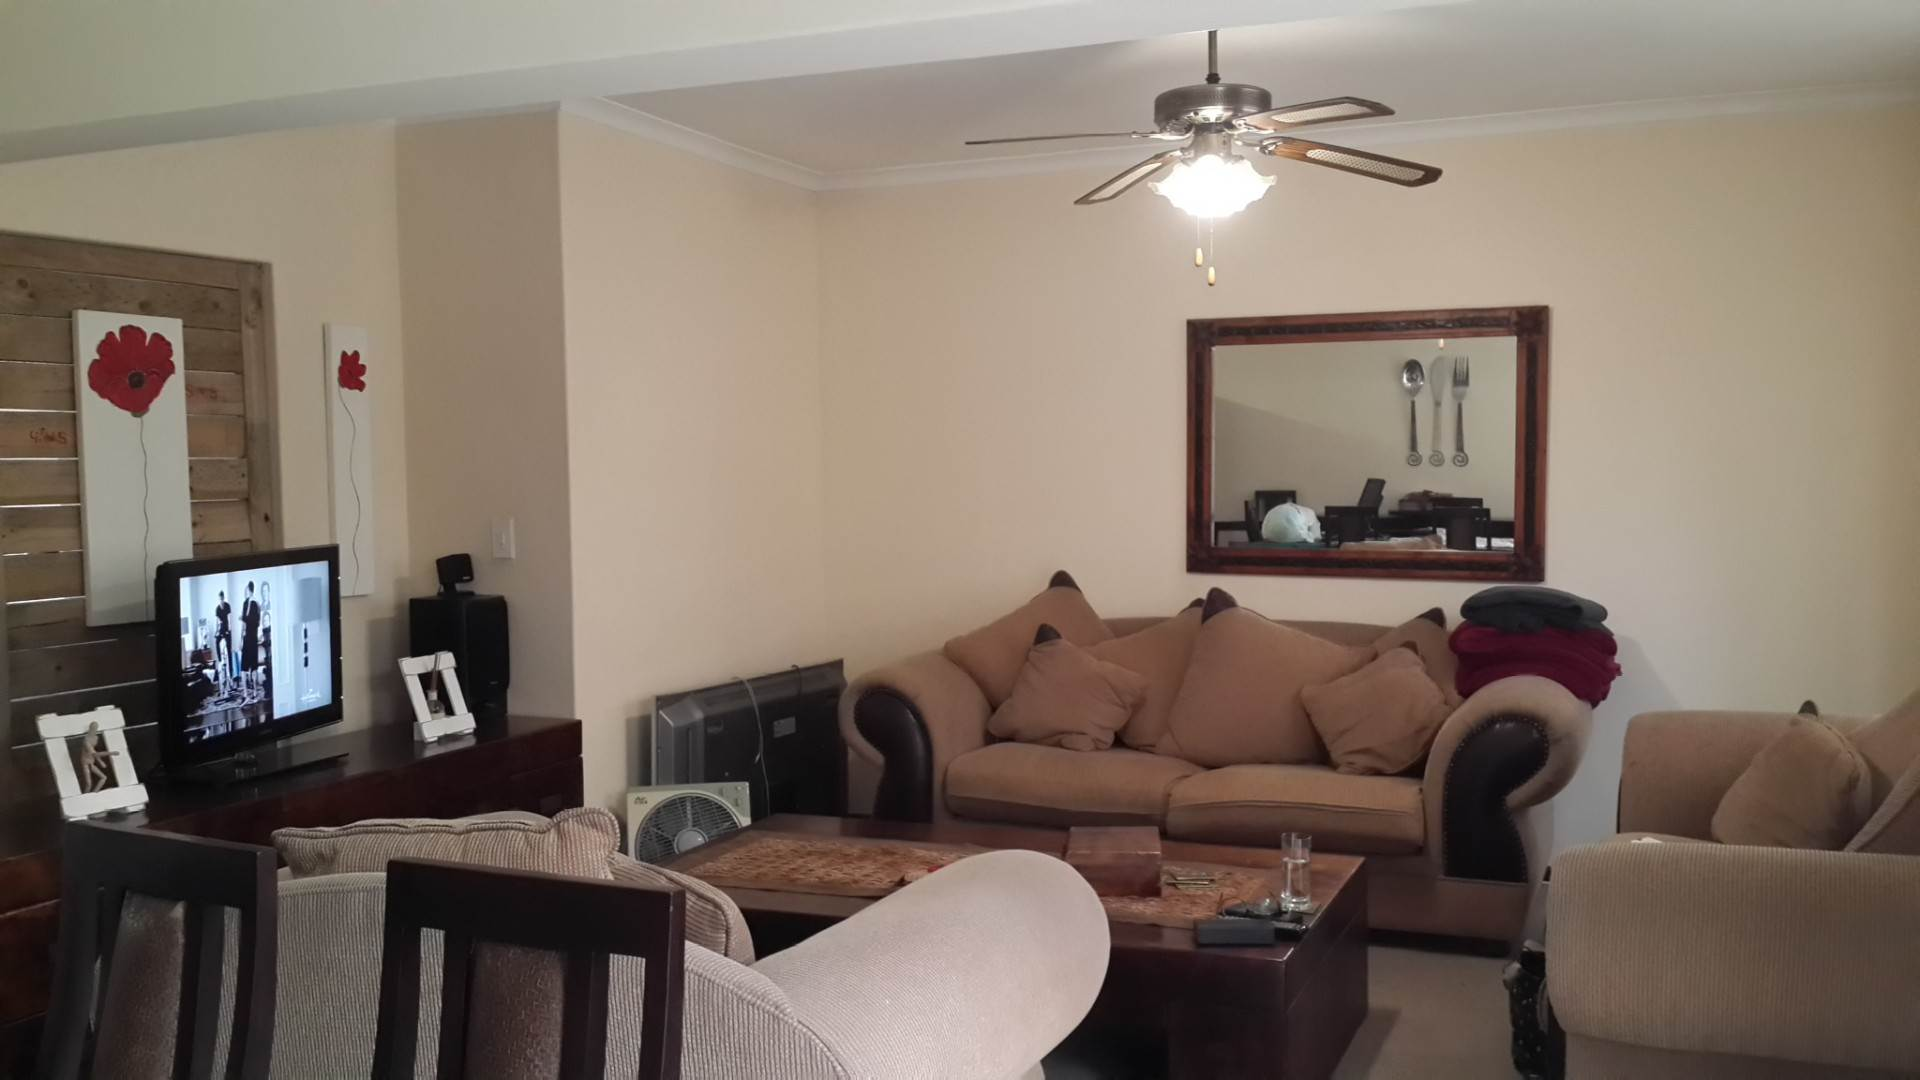 ceiling western fans sell best r reddup place to electric fan